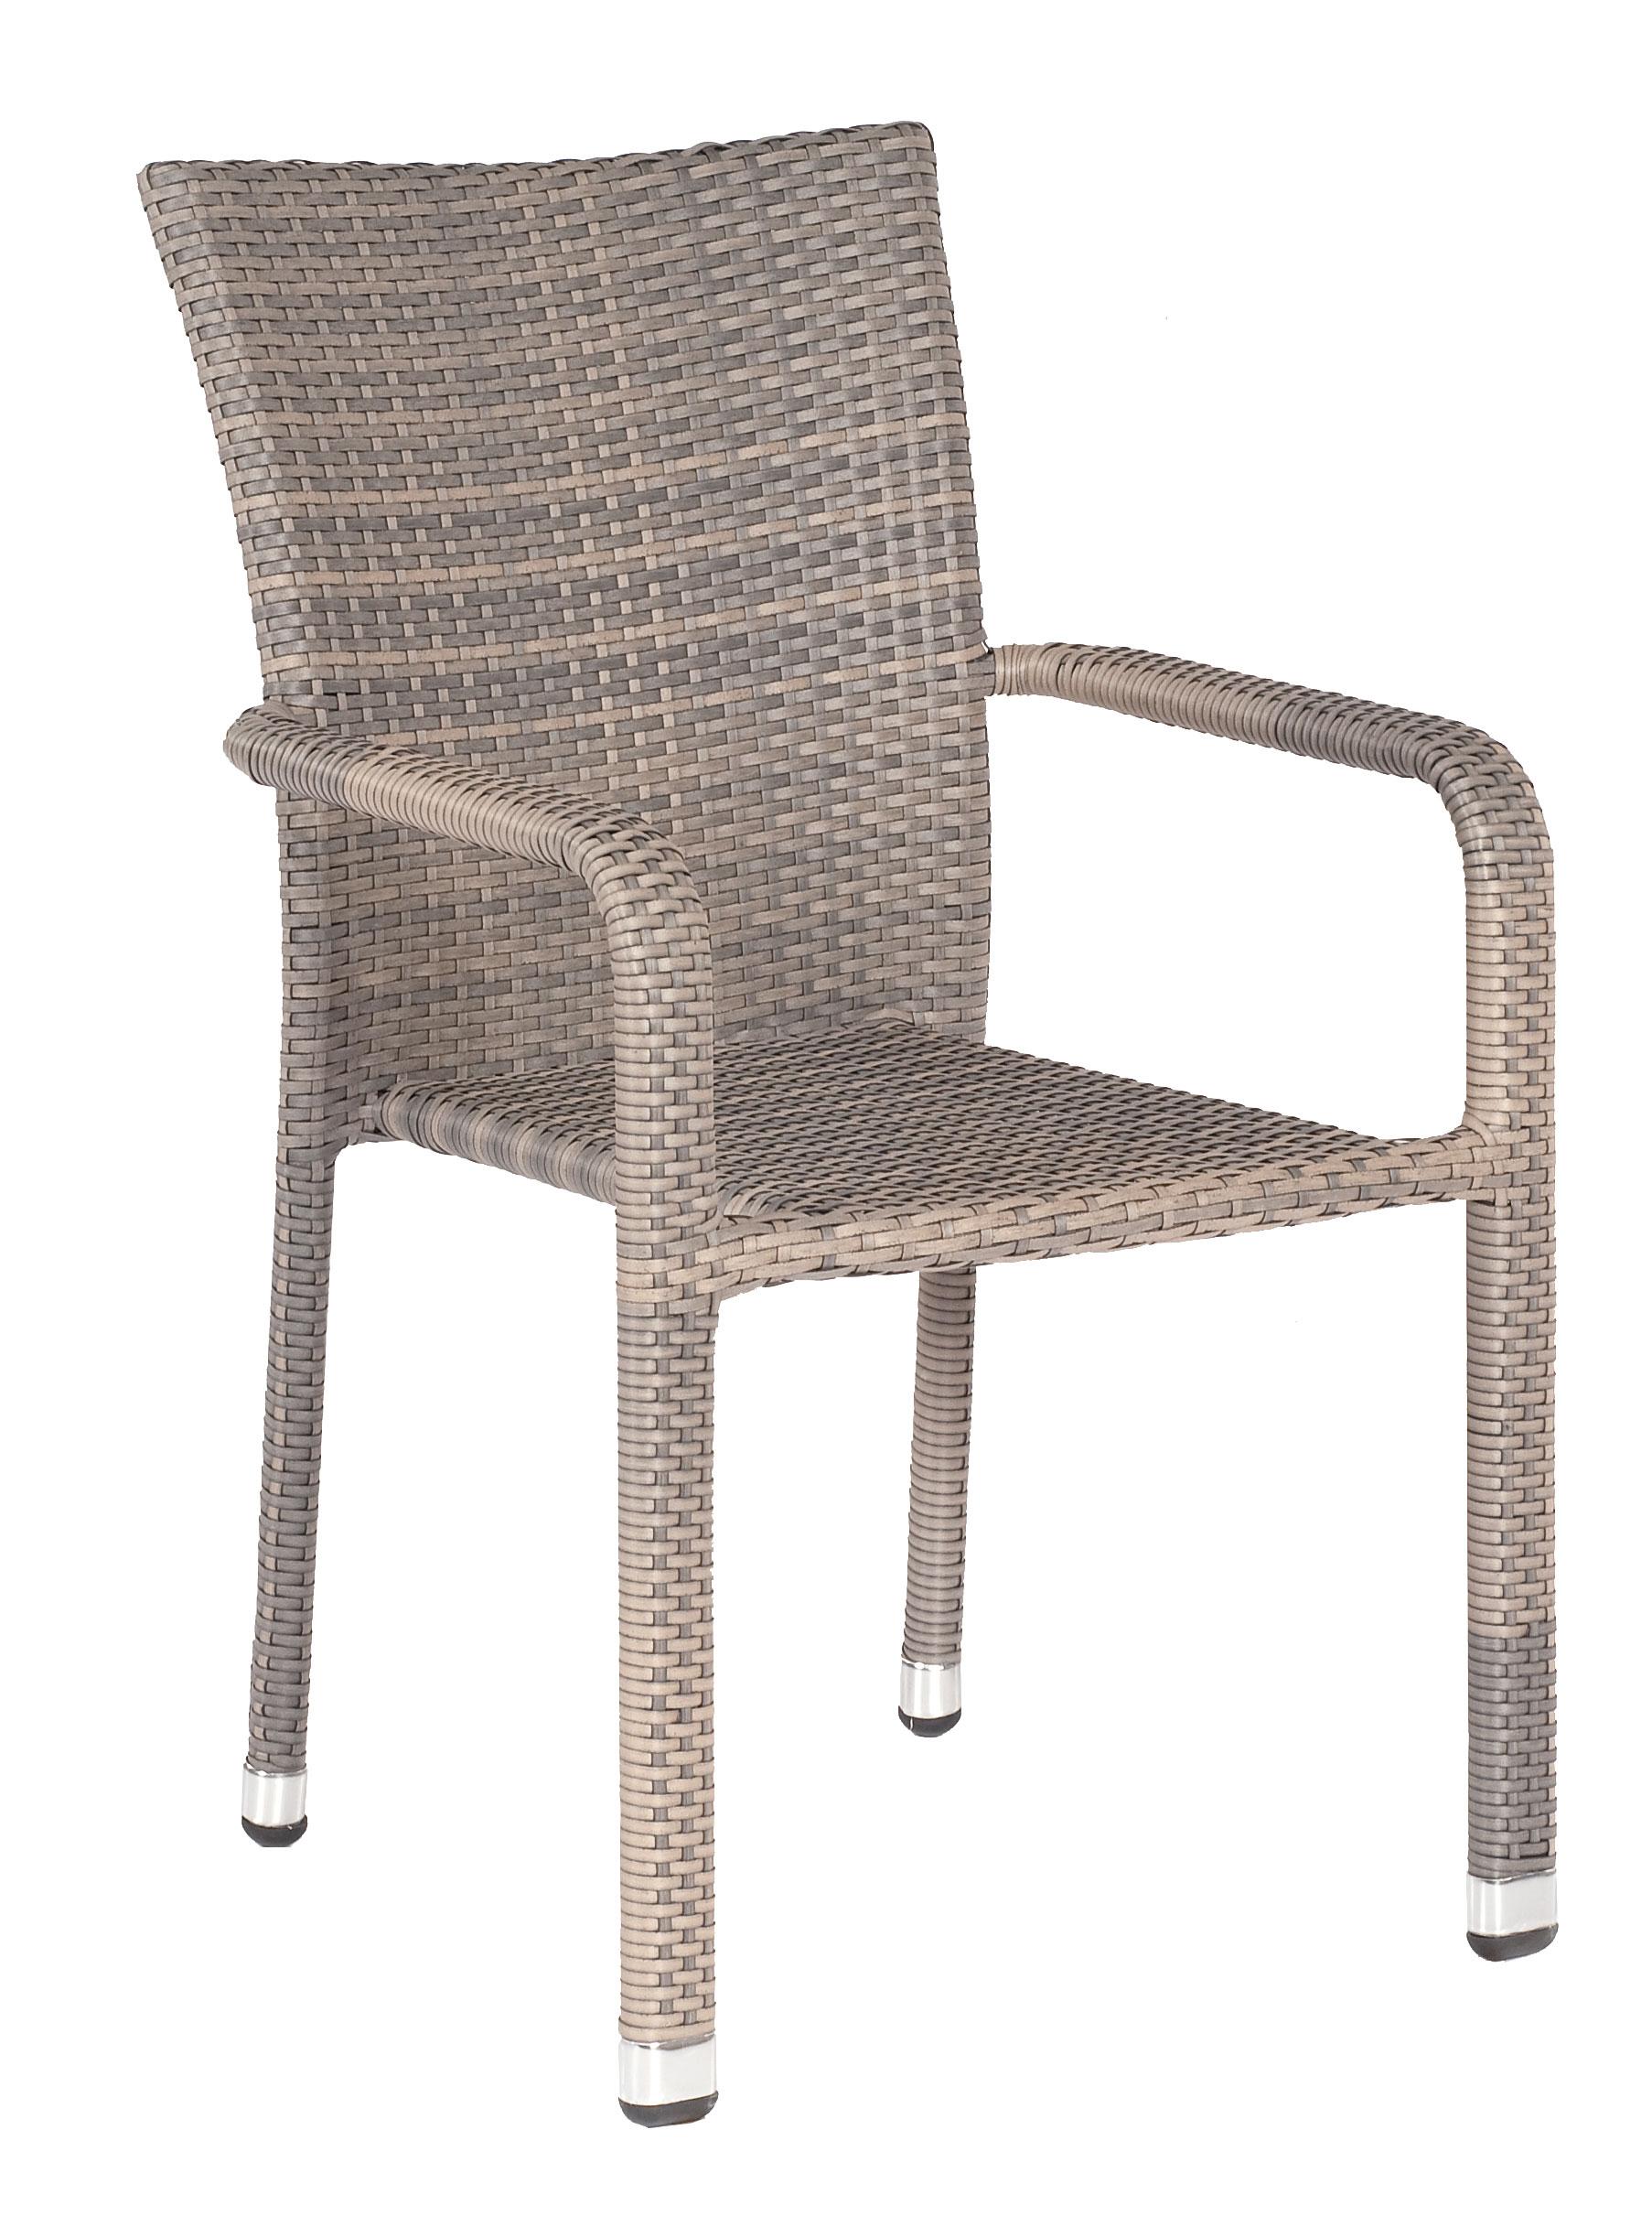 sunny smart korbsessel stapelbar korbm bel wetterf. Black Bedroom Furniture Sets. Home Design Ideas